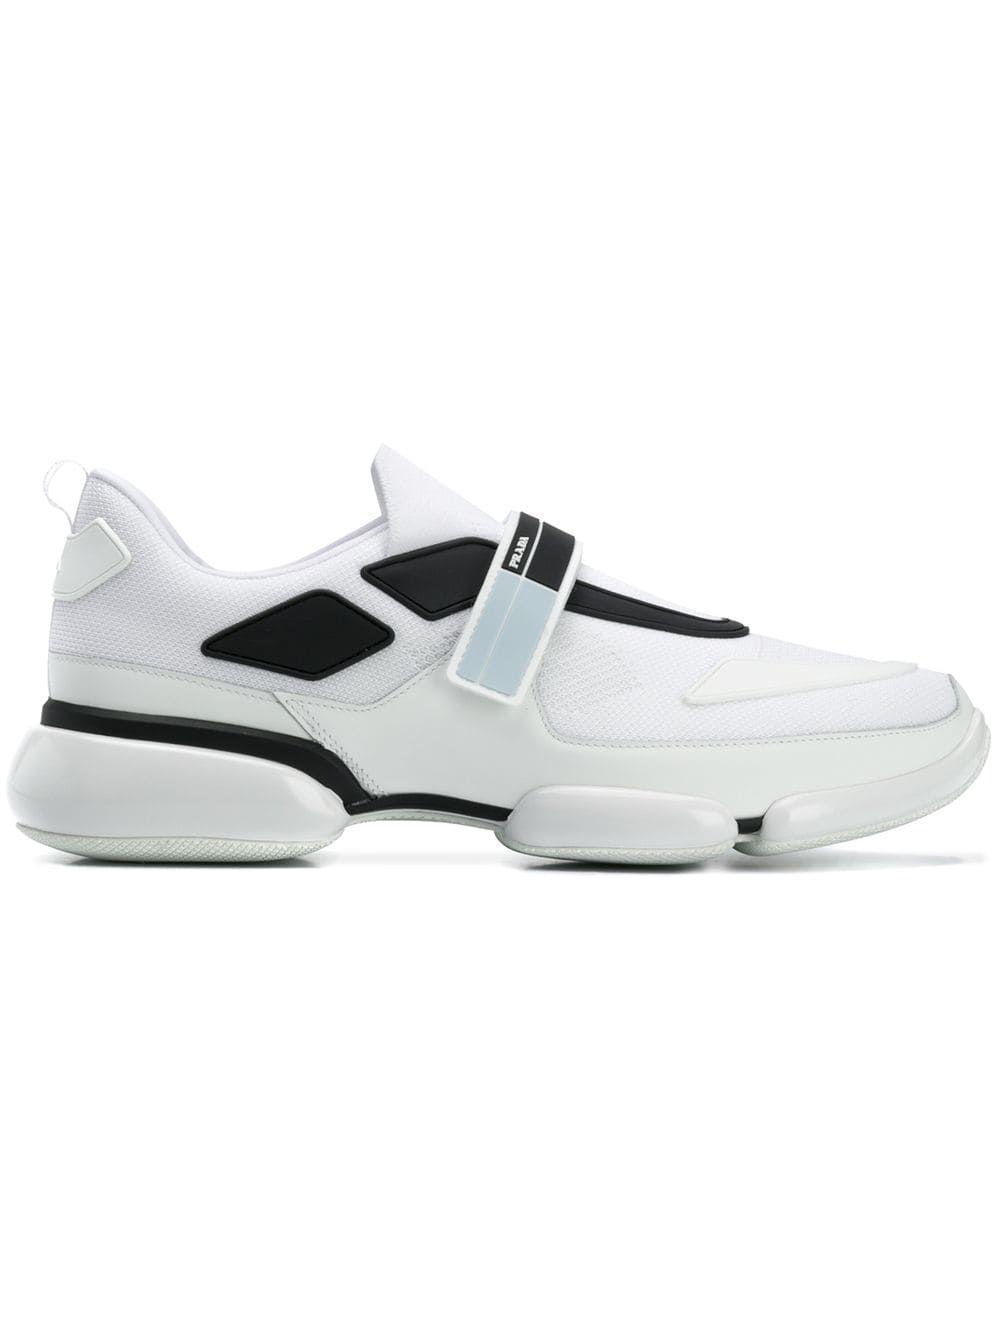 Prada Men S Shoes Trainers Sneakers Cloudbust In White Modesens Prada Men Shoes Sneakers Prada Men